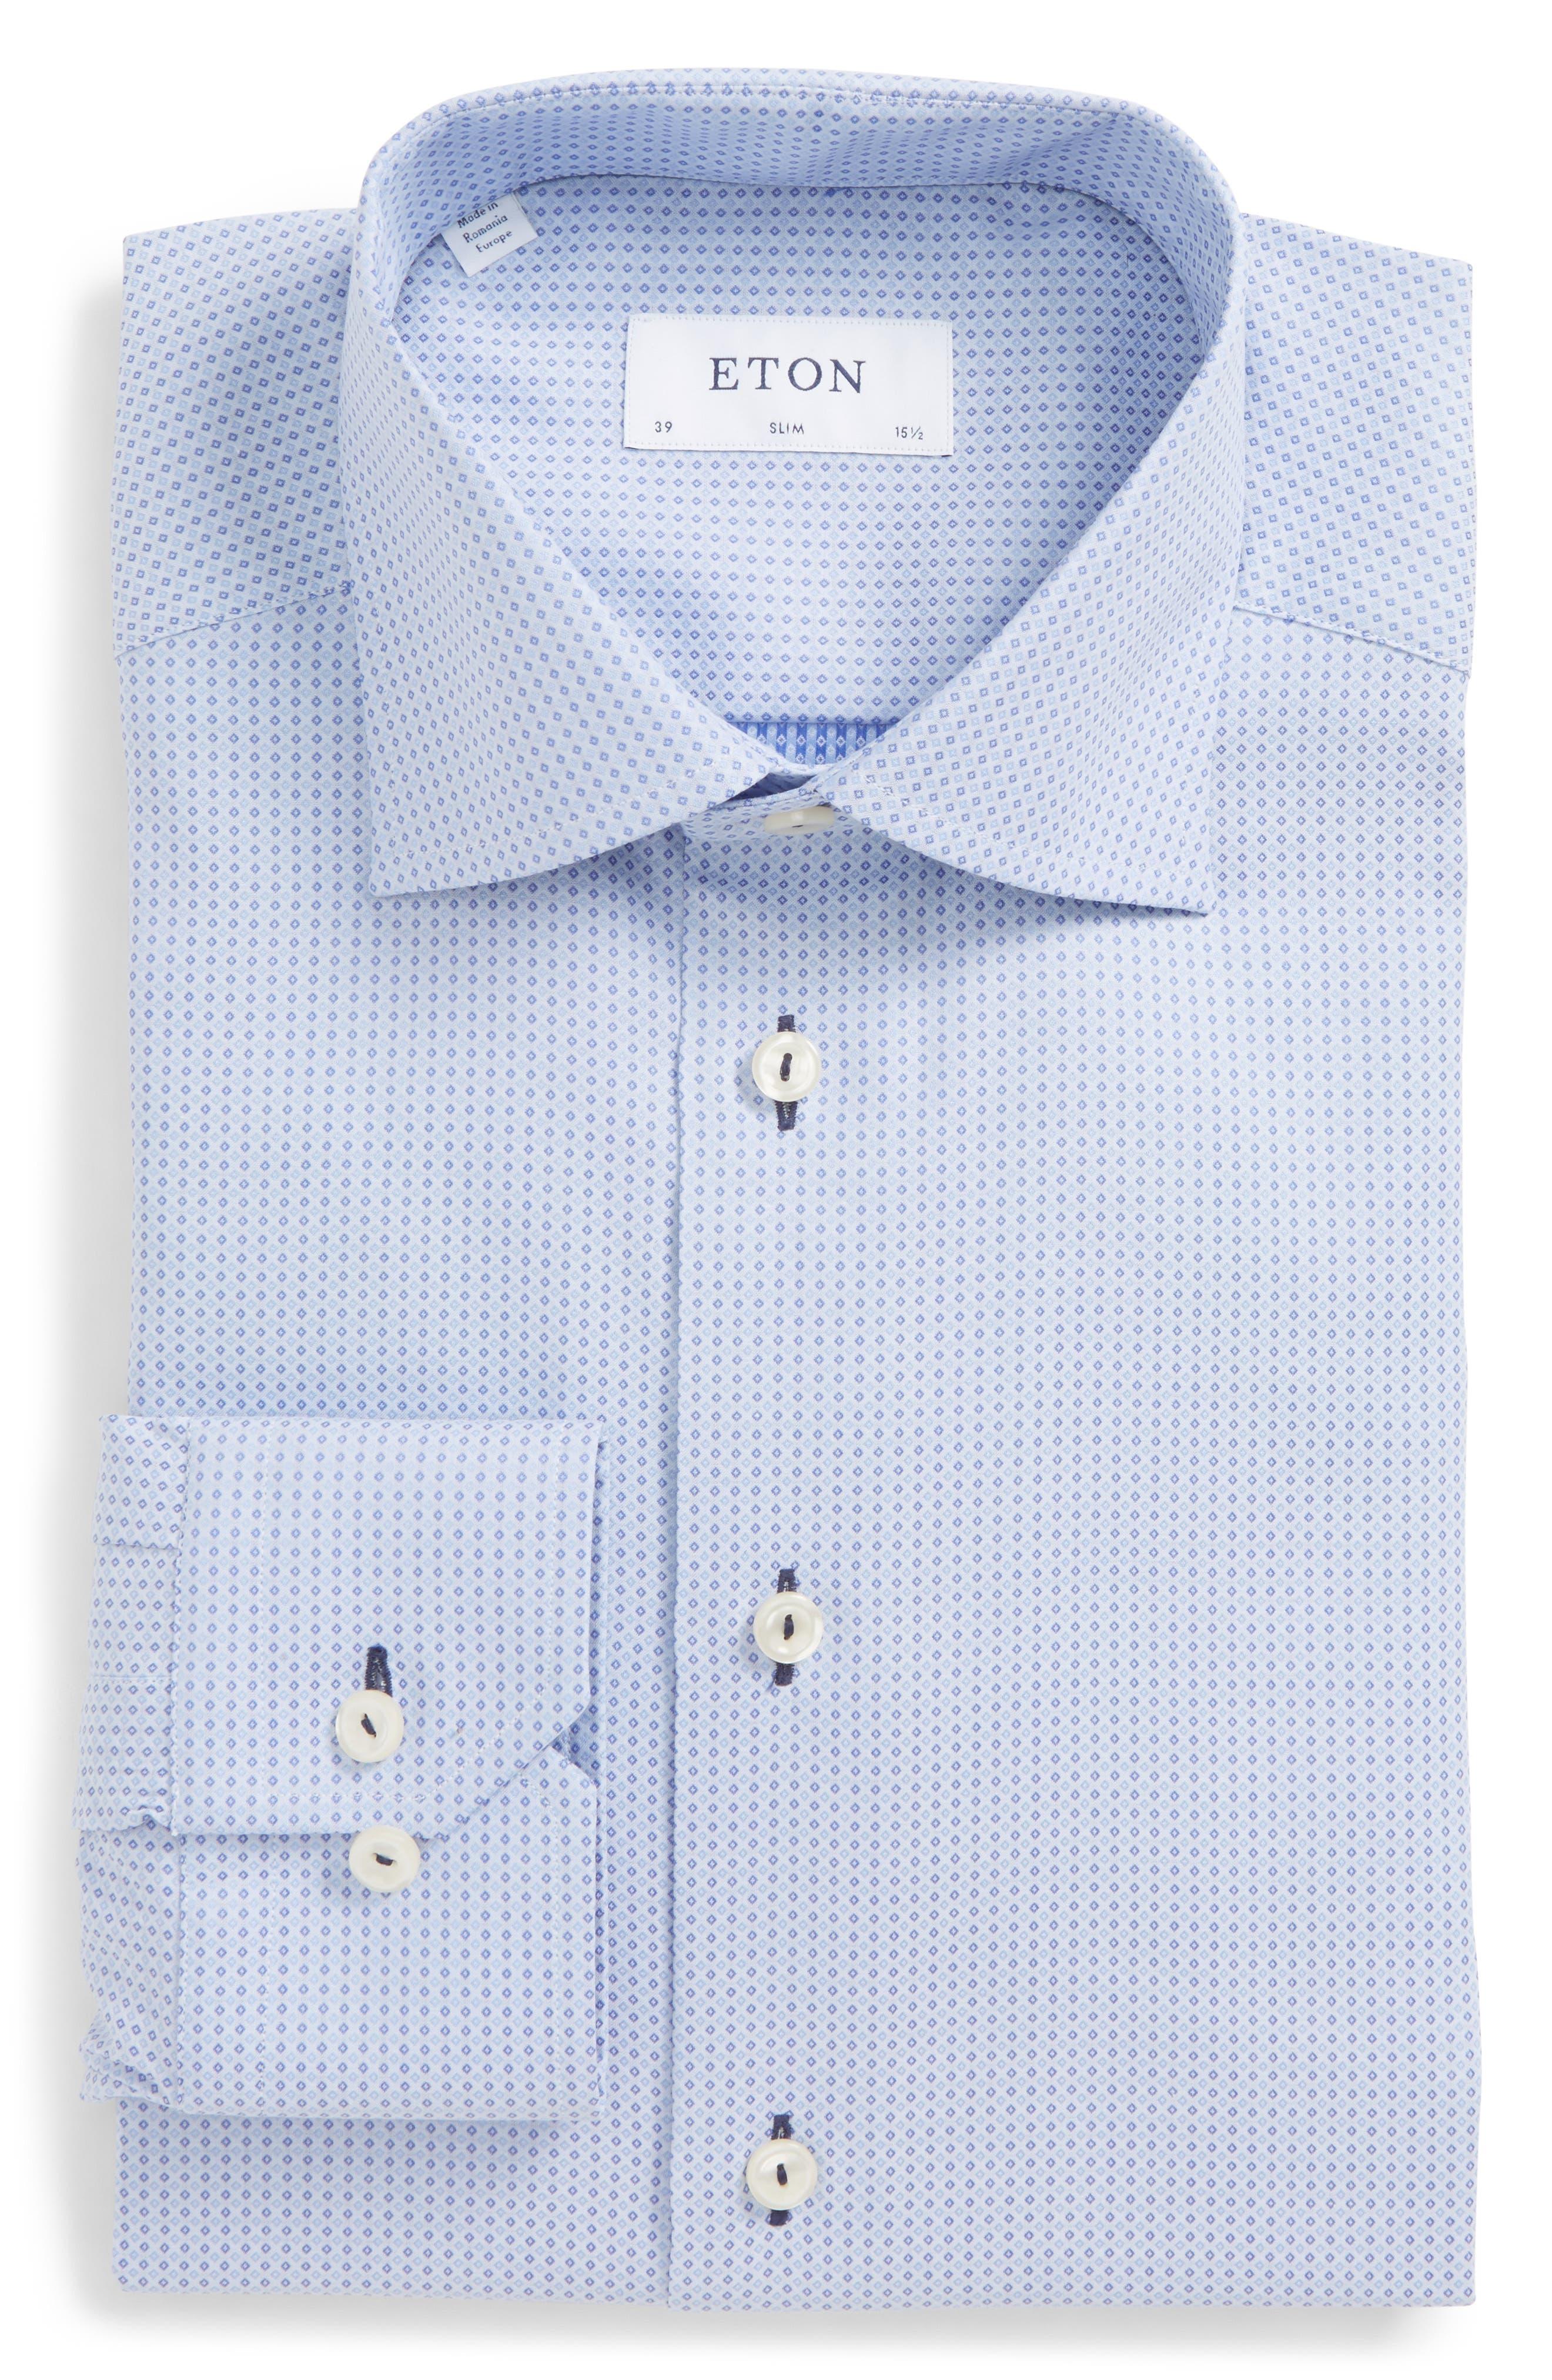 Alternate Image 1 Selected - Eton Slim Fit Grid Dress Shirt